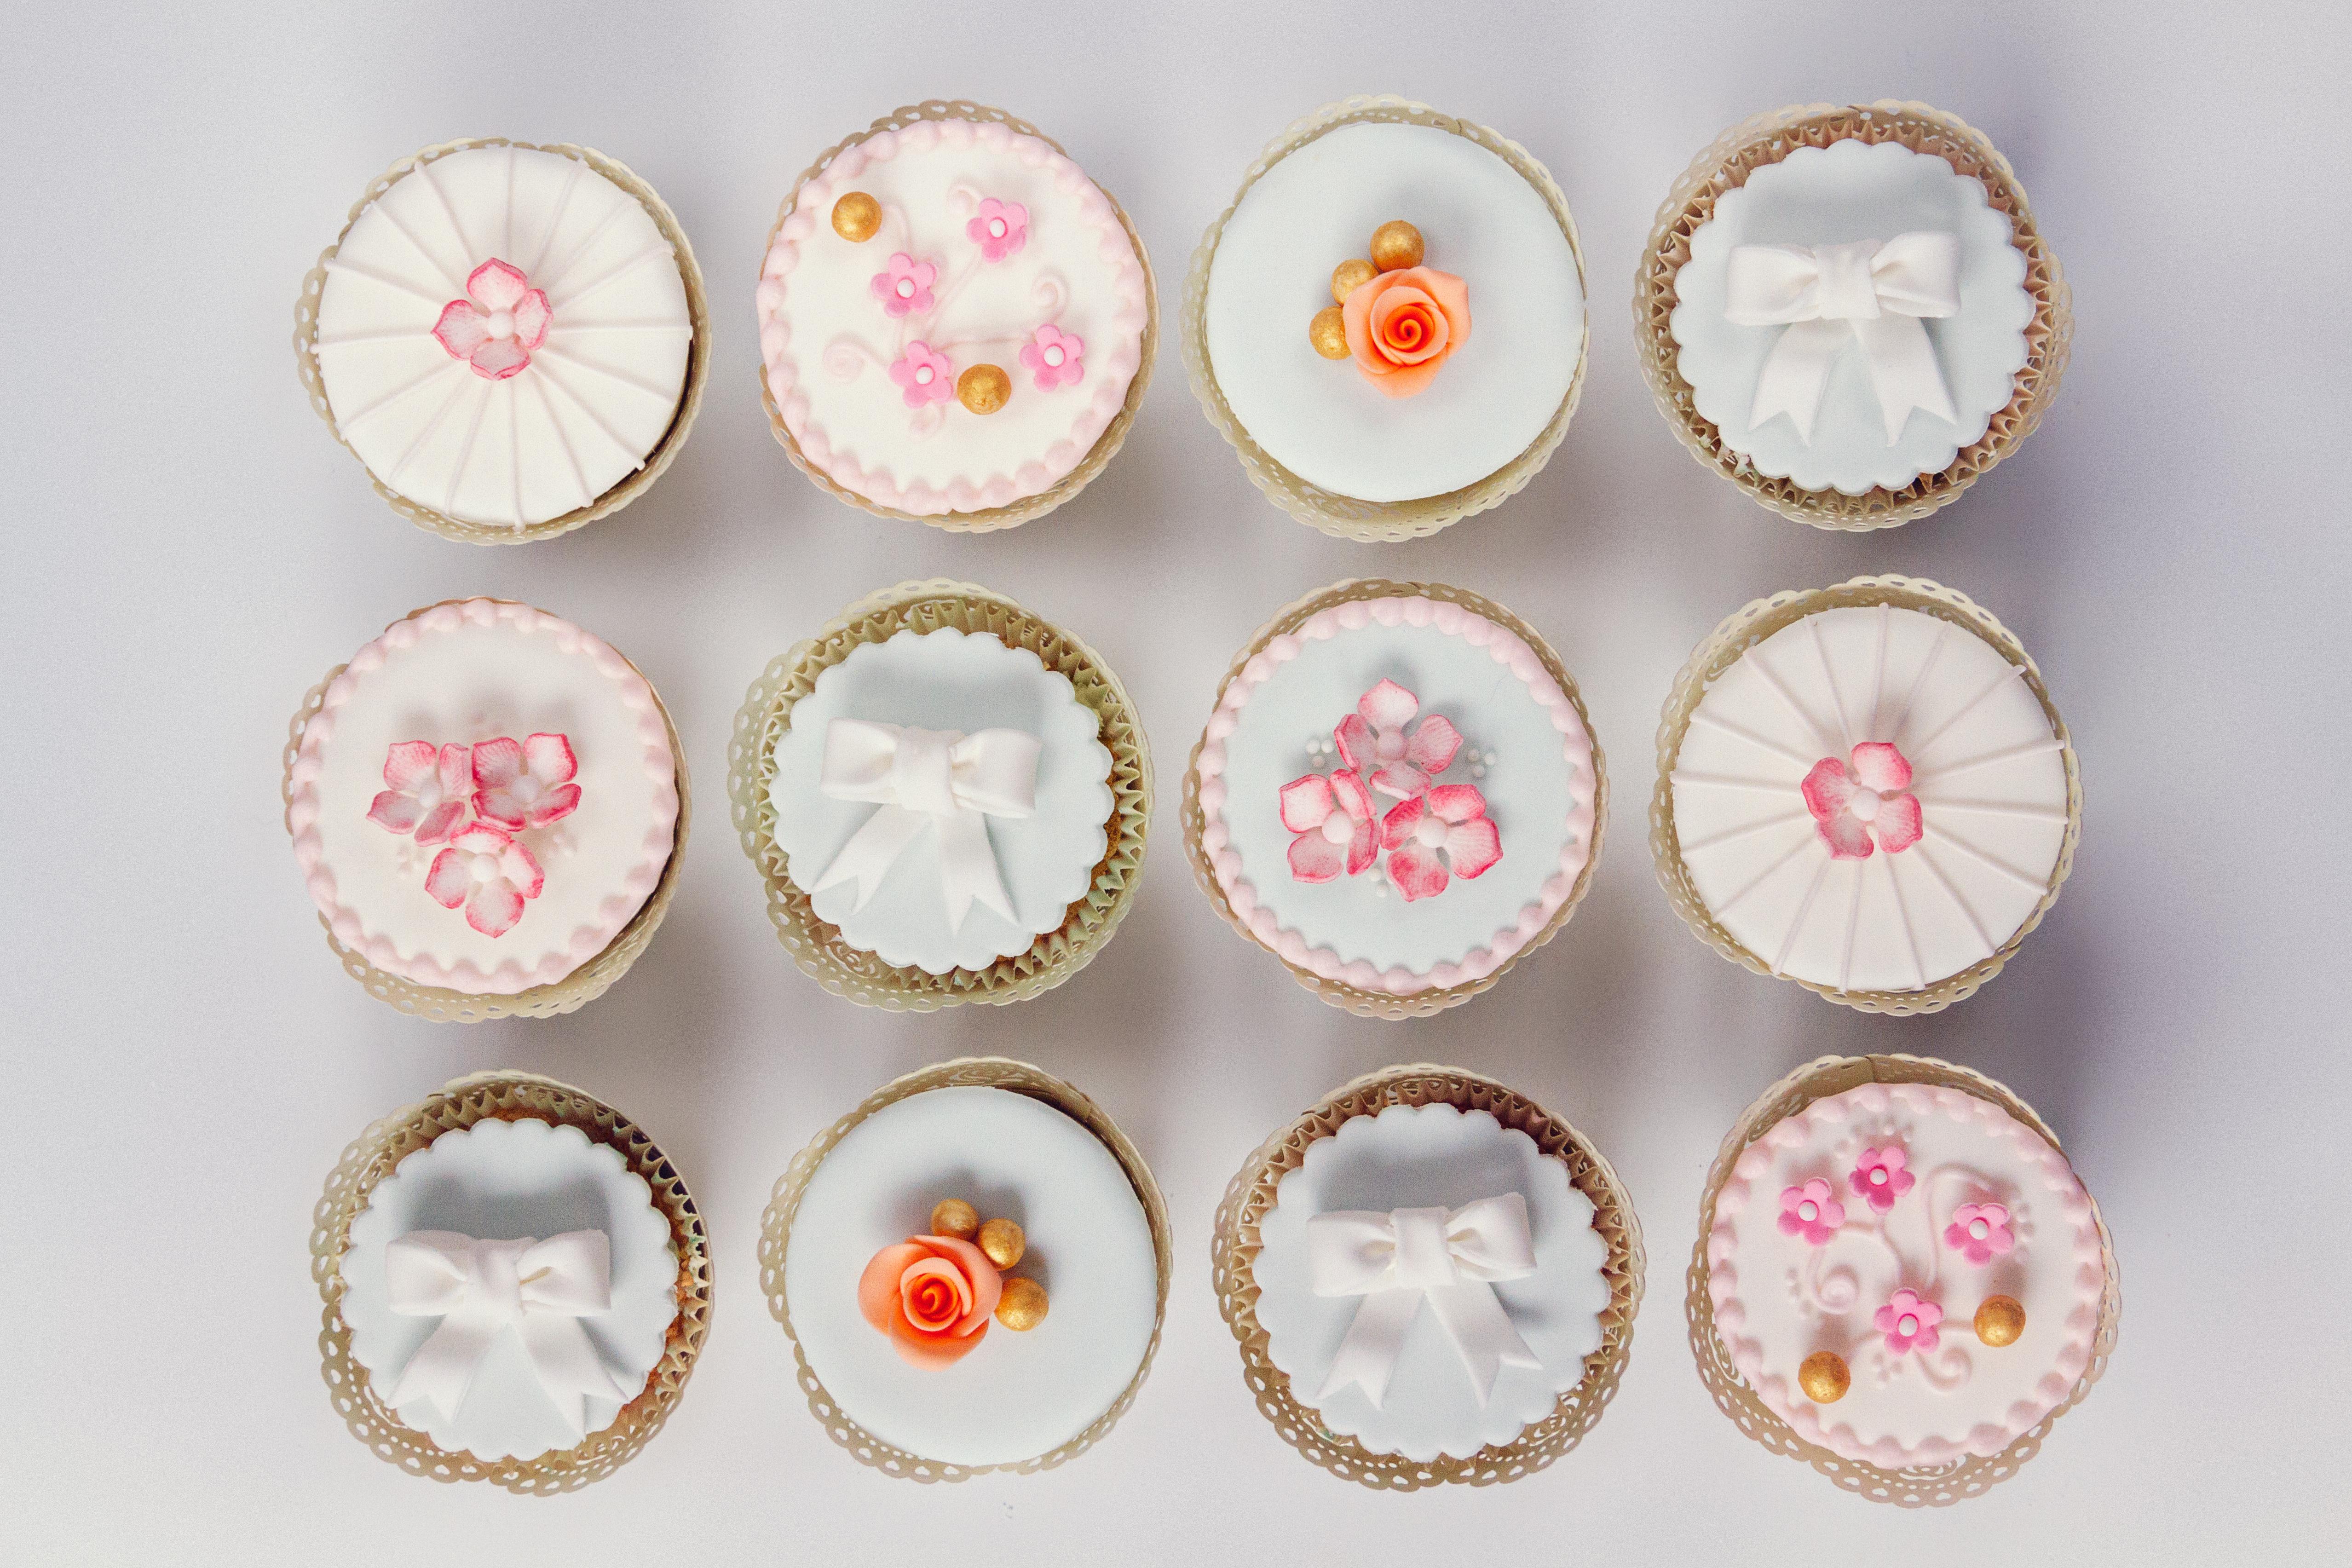 Petals & bow cupcakes